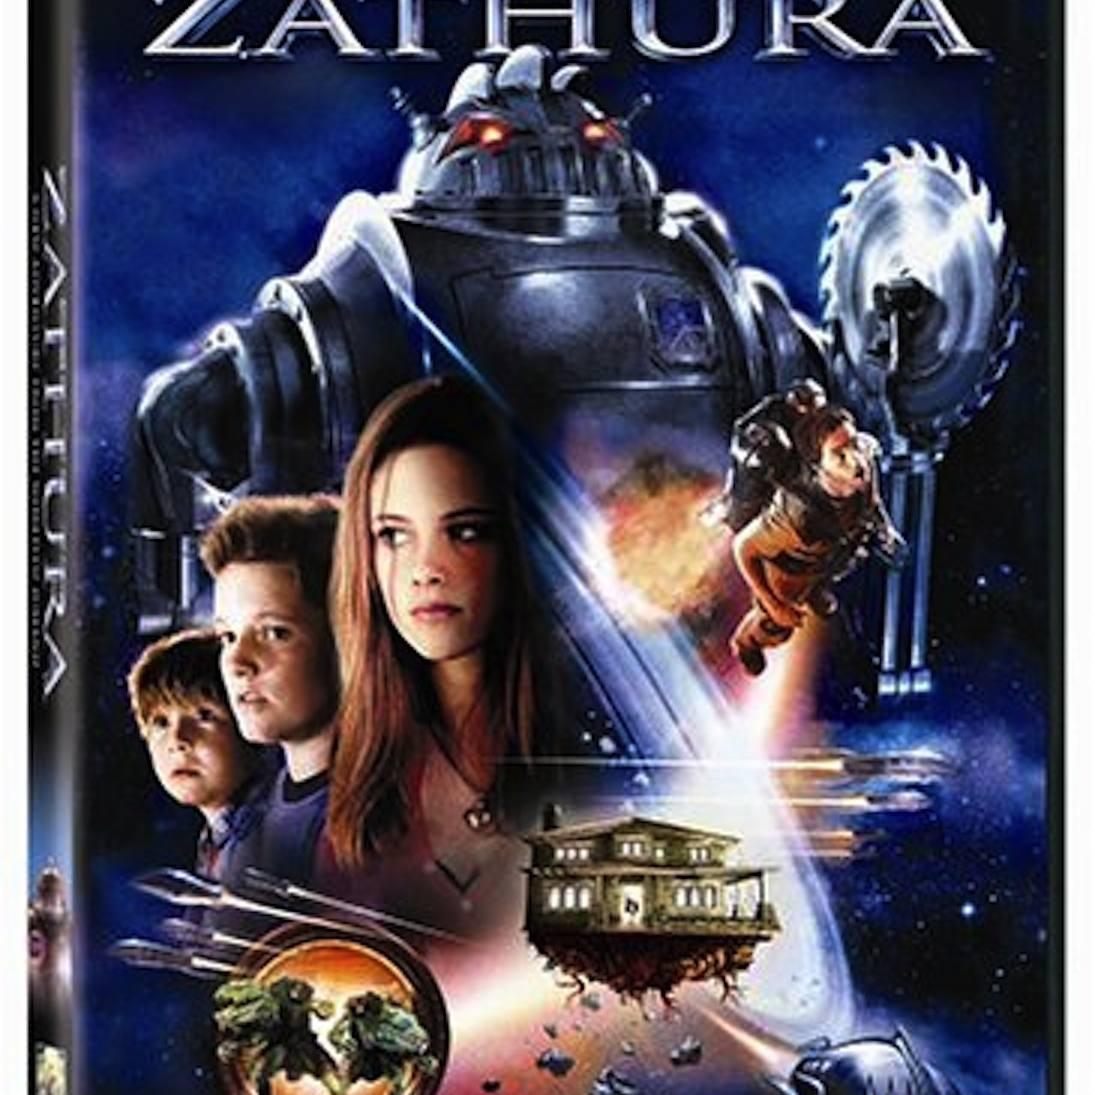 Zathura